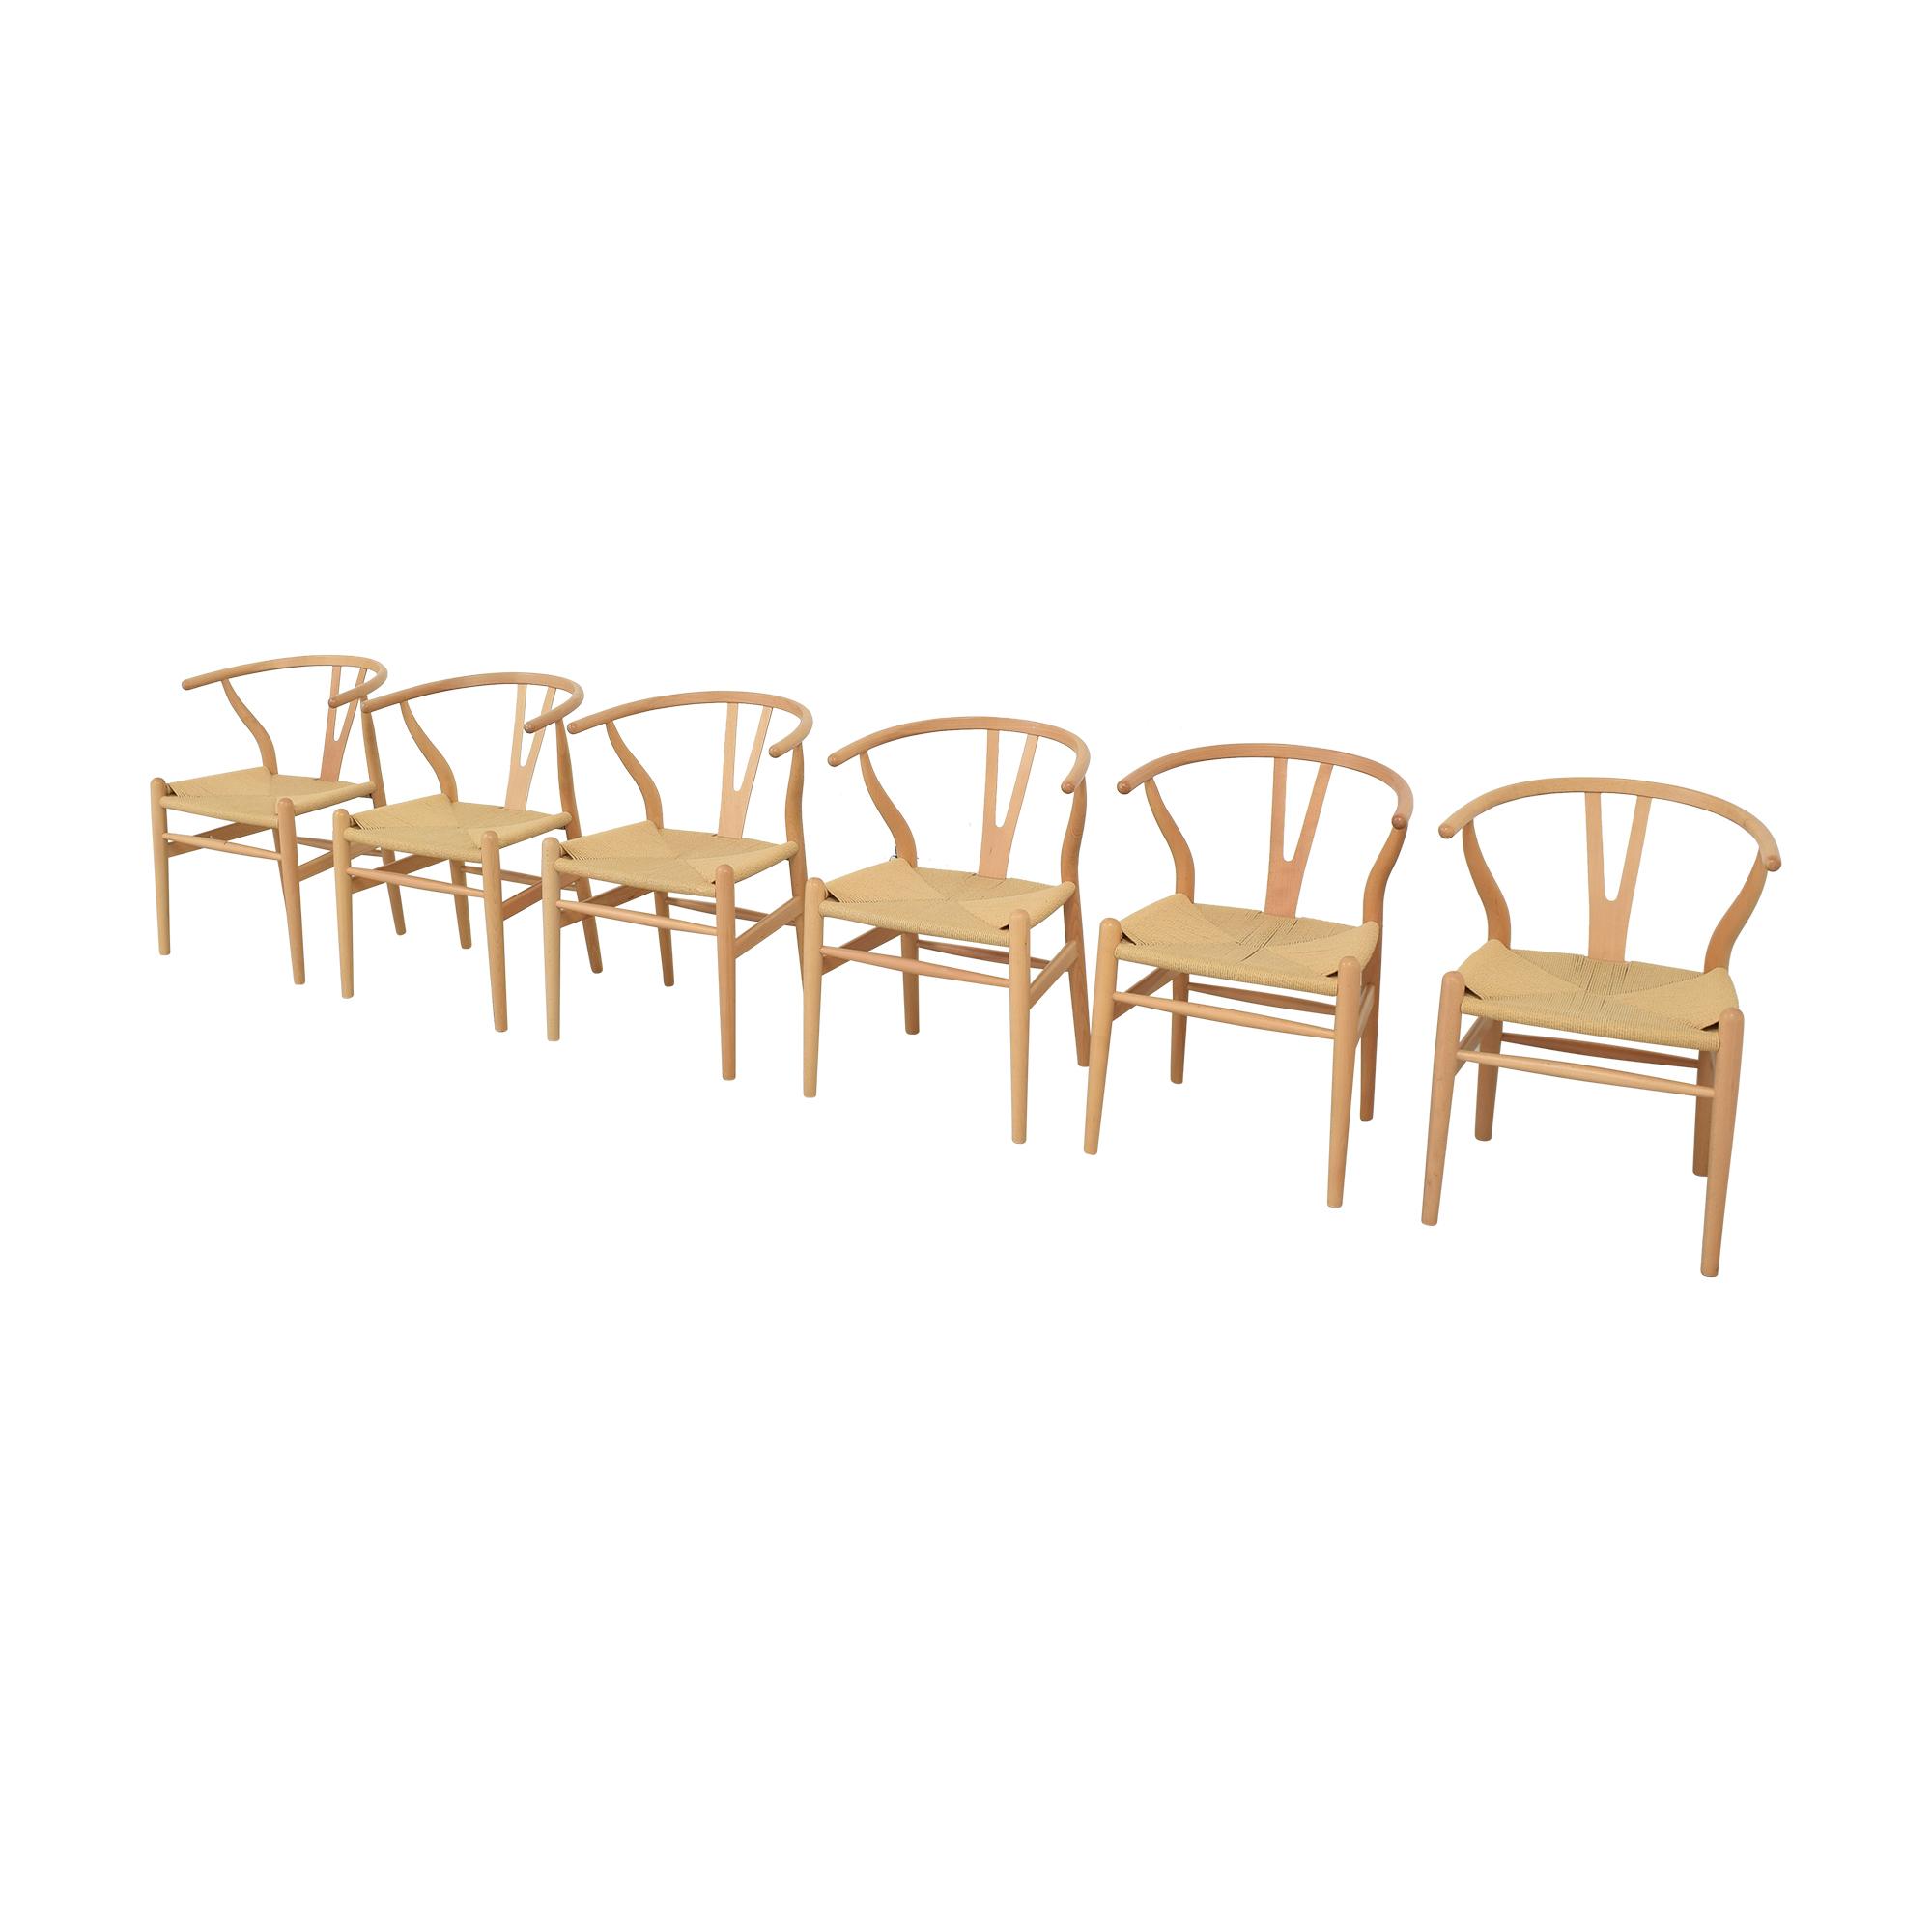 buy Baxton Studio Wishbone Modern Brown Wood Dining Chairs Baxton Studio Dining Chairs